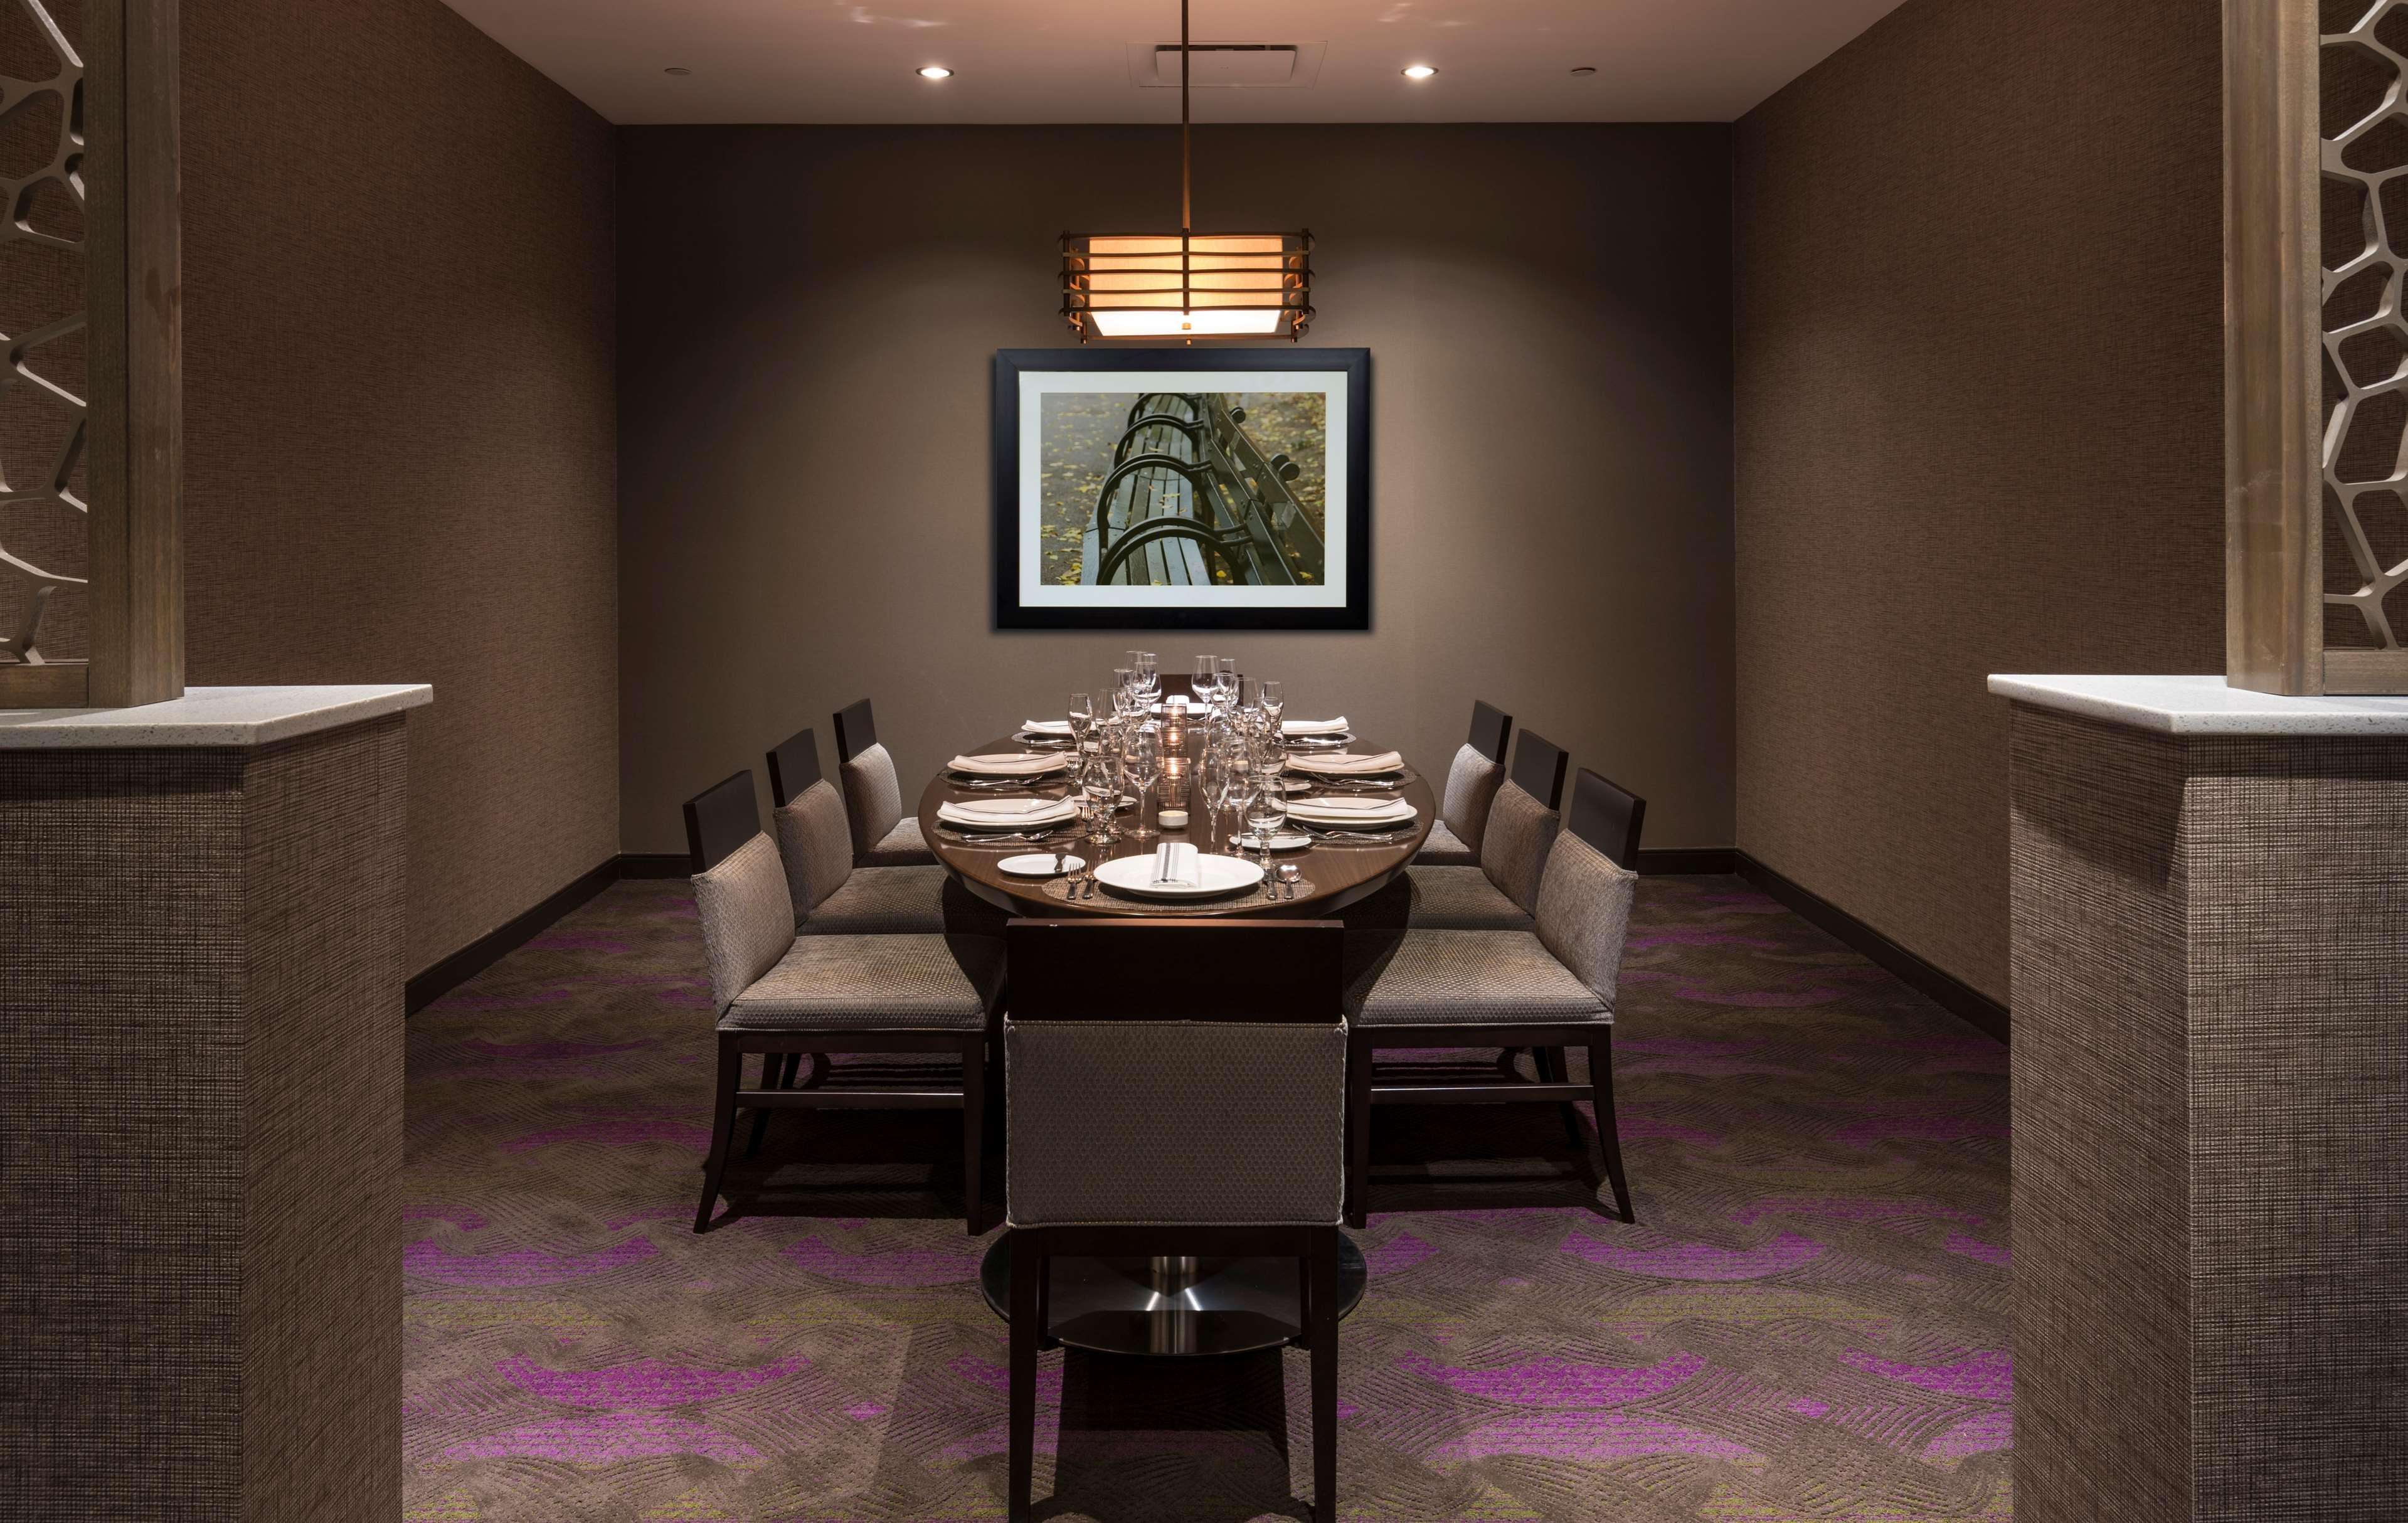 Hilton Washington DC/Rockville Hotel & Executive Meeting Ctr image 25